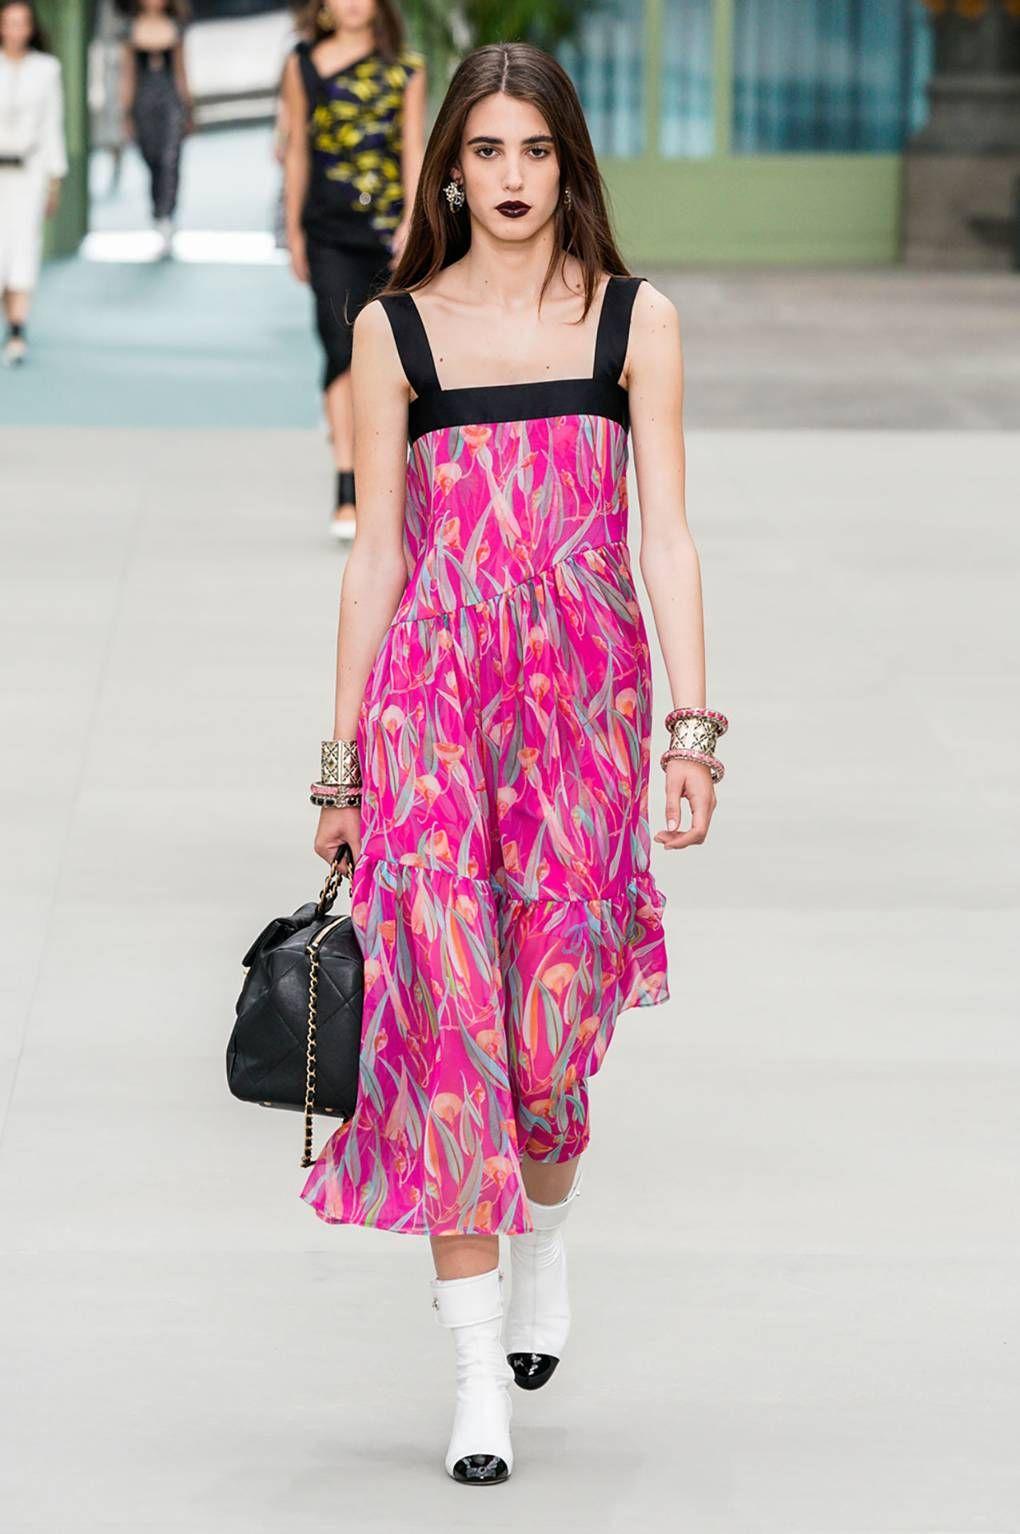 Chanel Spring/Summer 2020 Resort Fashion, Chanel resort